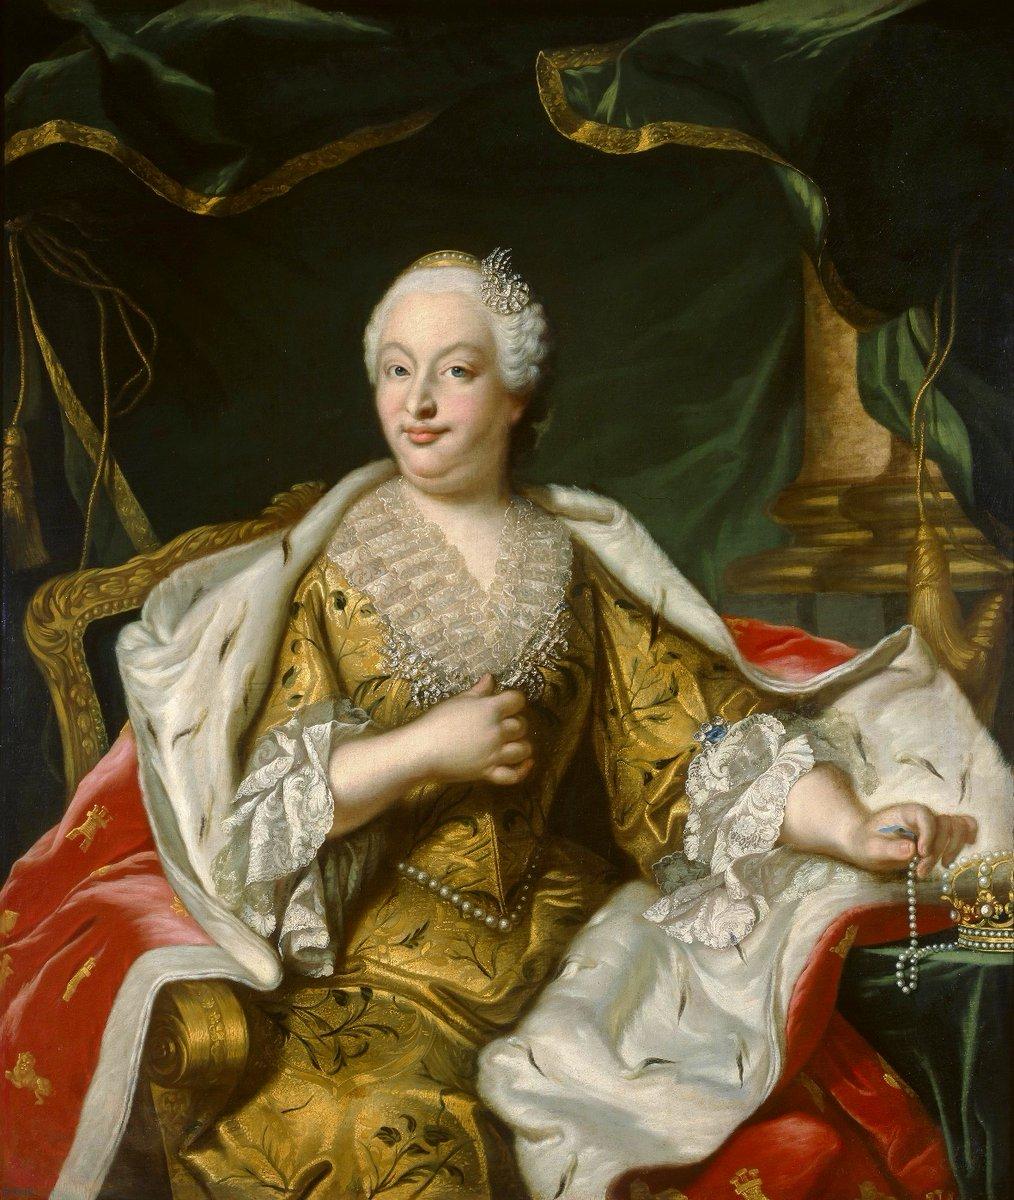 Born #OnThisDay in 1711: #BarbaraofPortugal (1711-58), Queen of Spain as spouse of #FerdinandoVI   Portrait after #LouisMichelvanLoo (1707-71), 18th Century  #Braganza #Bourbon